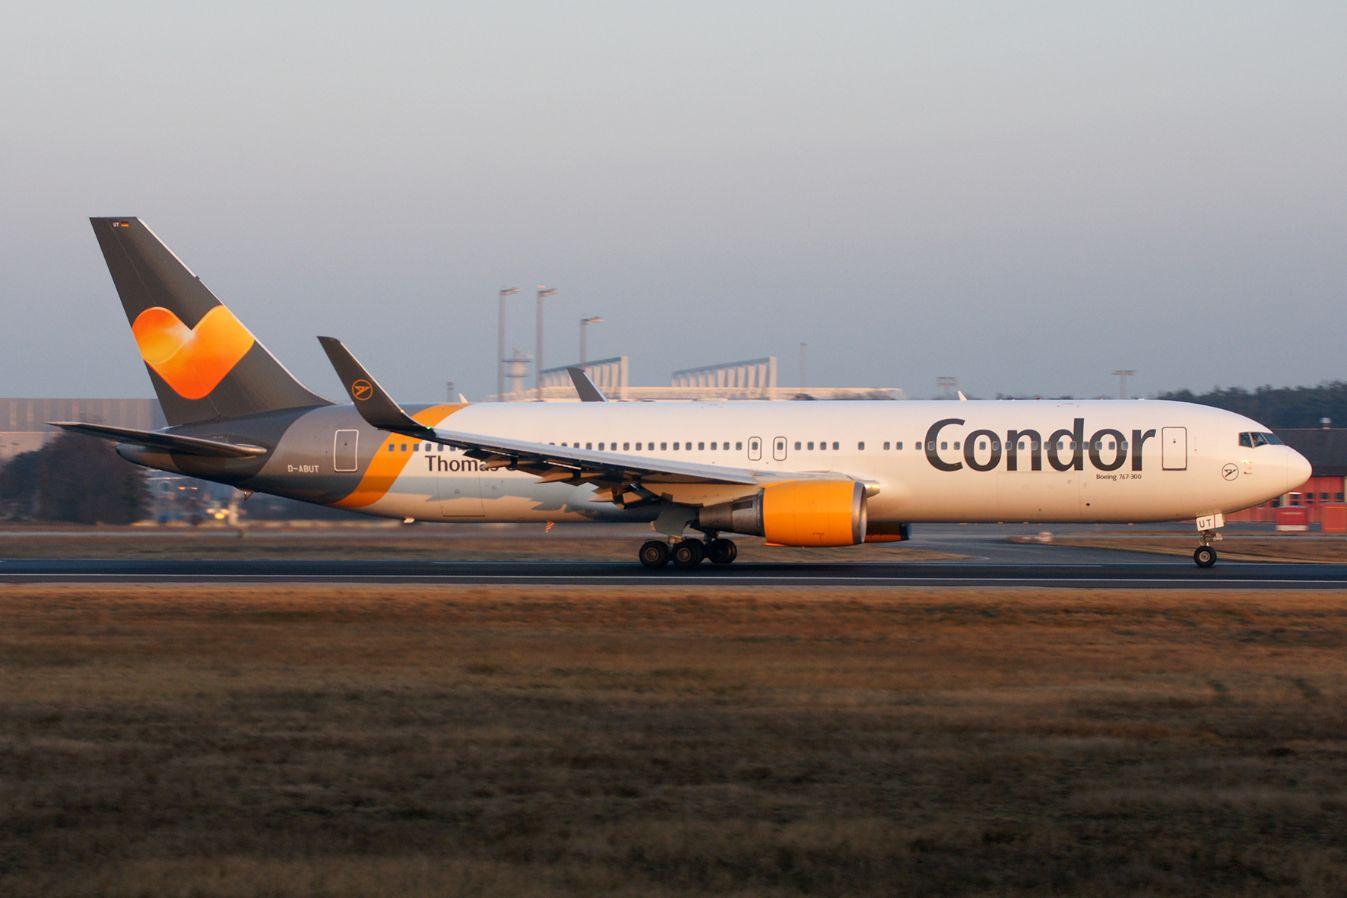 Condor Winterflugplan 2019 20 Buchbar Touristiknews De